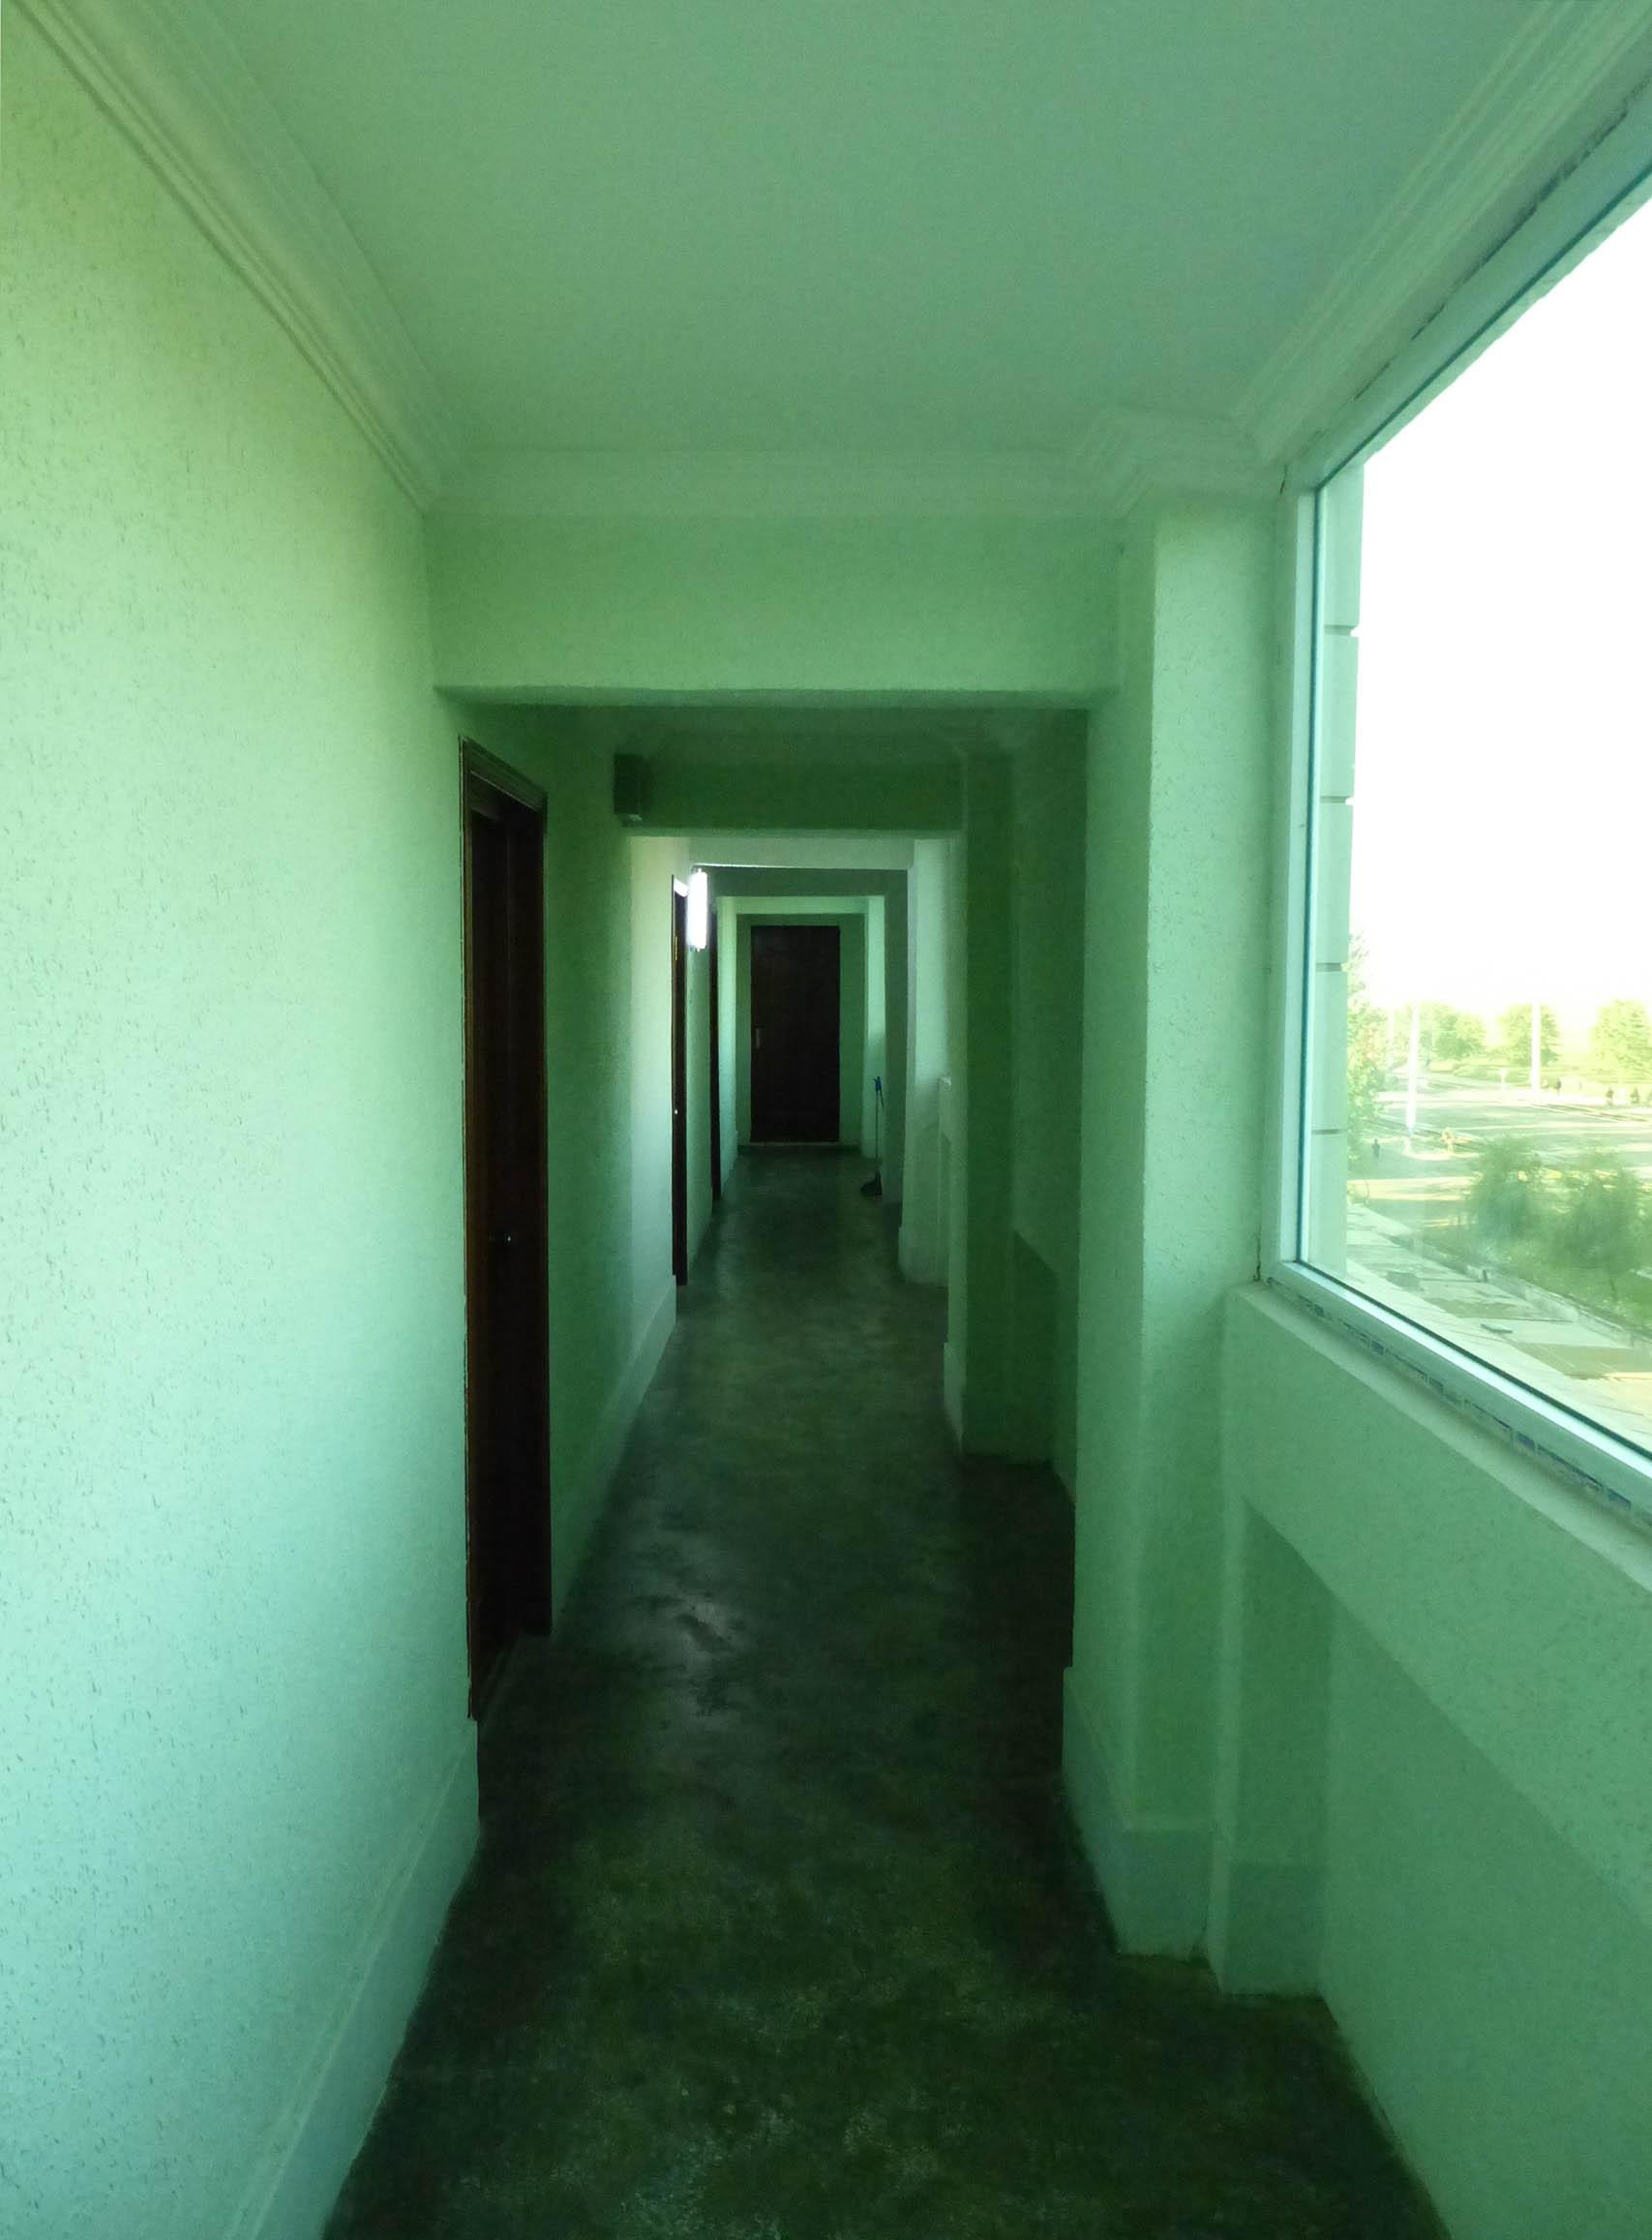 Green painted corridor